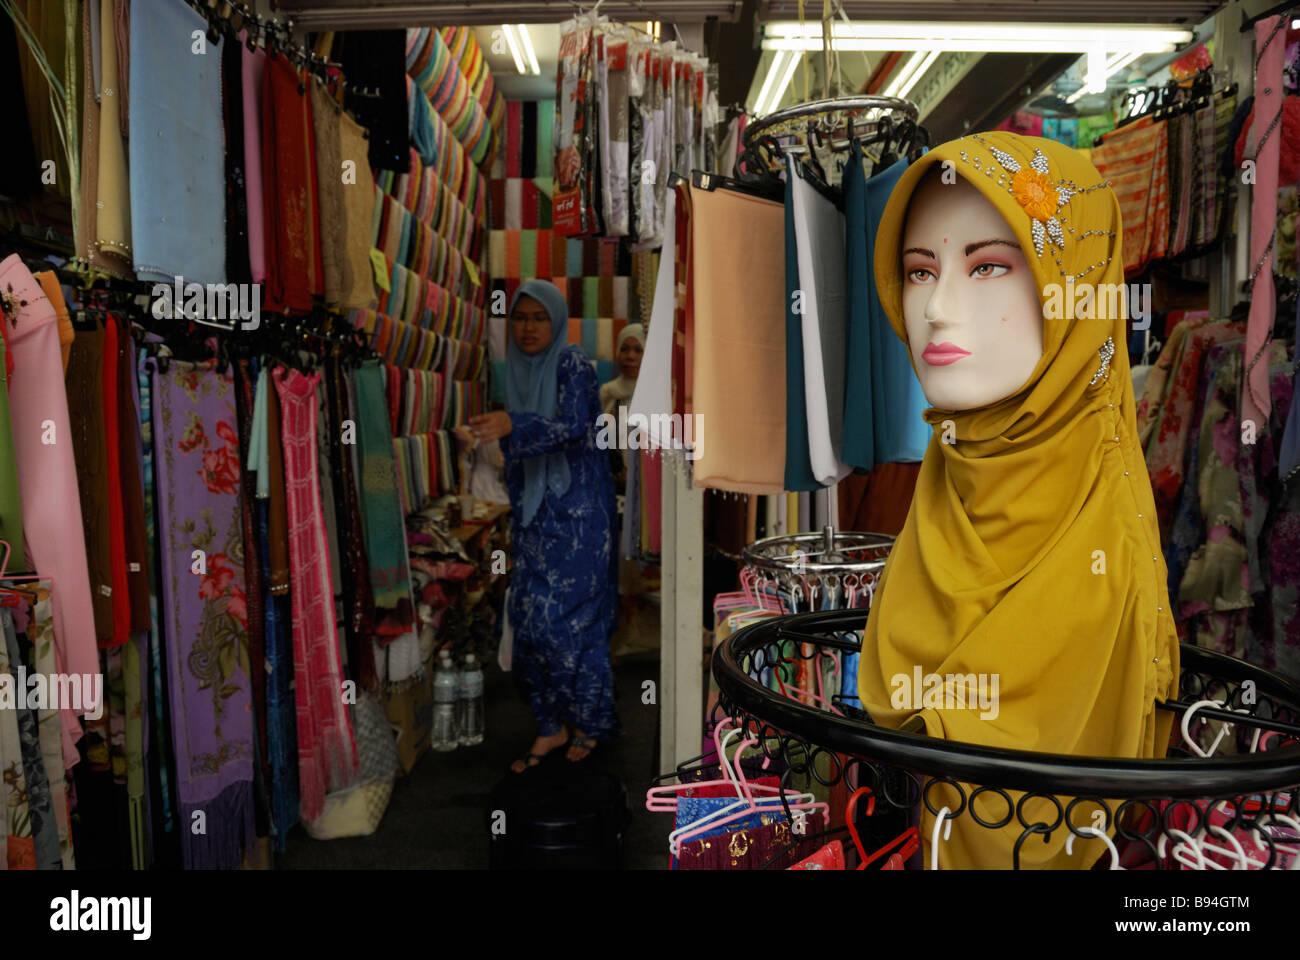 41906bdb7f An indian clothes shop in Little India, Kuala Lumpur, Malaysia. - Stock  Image